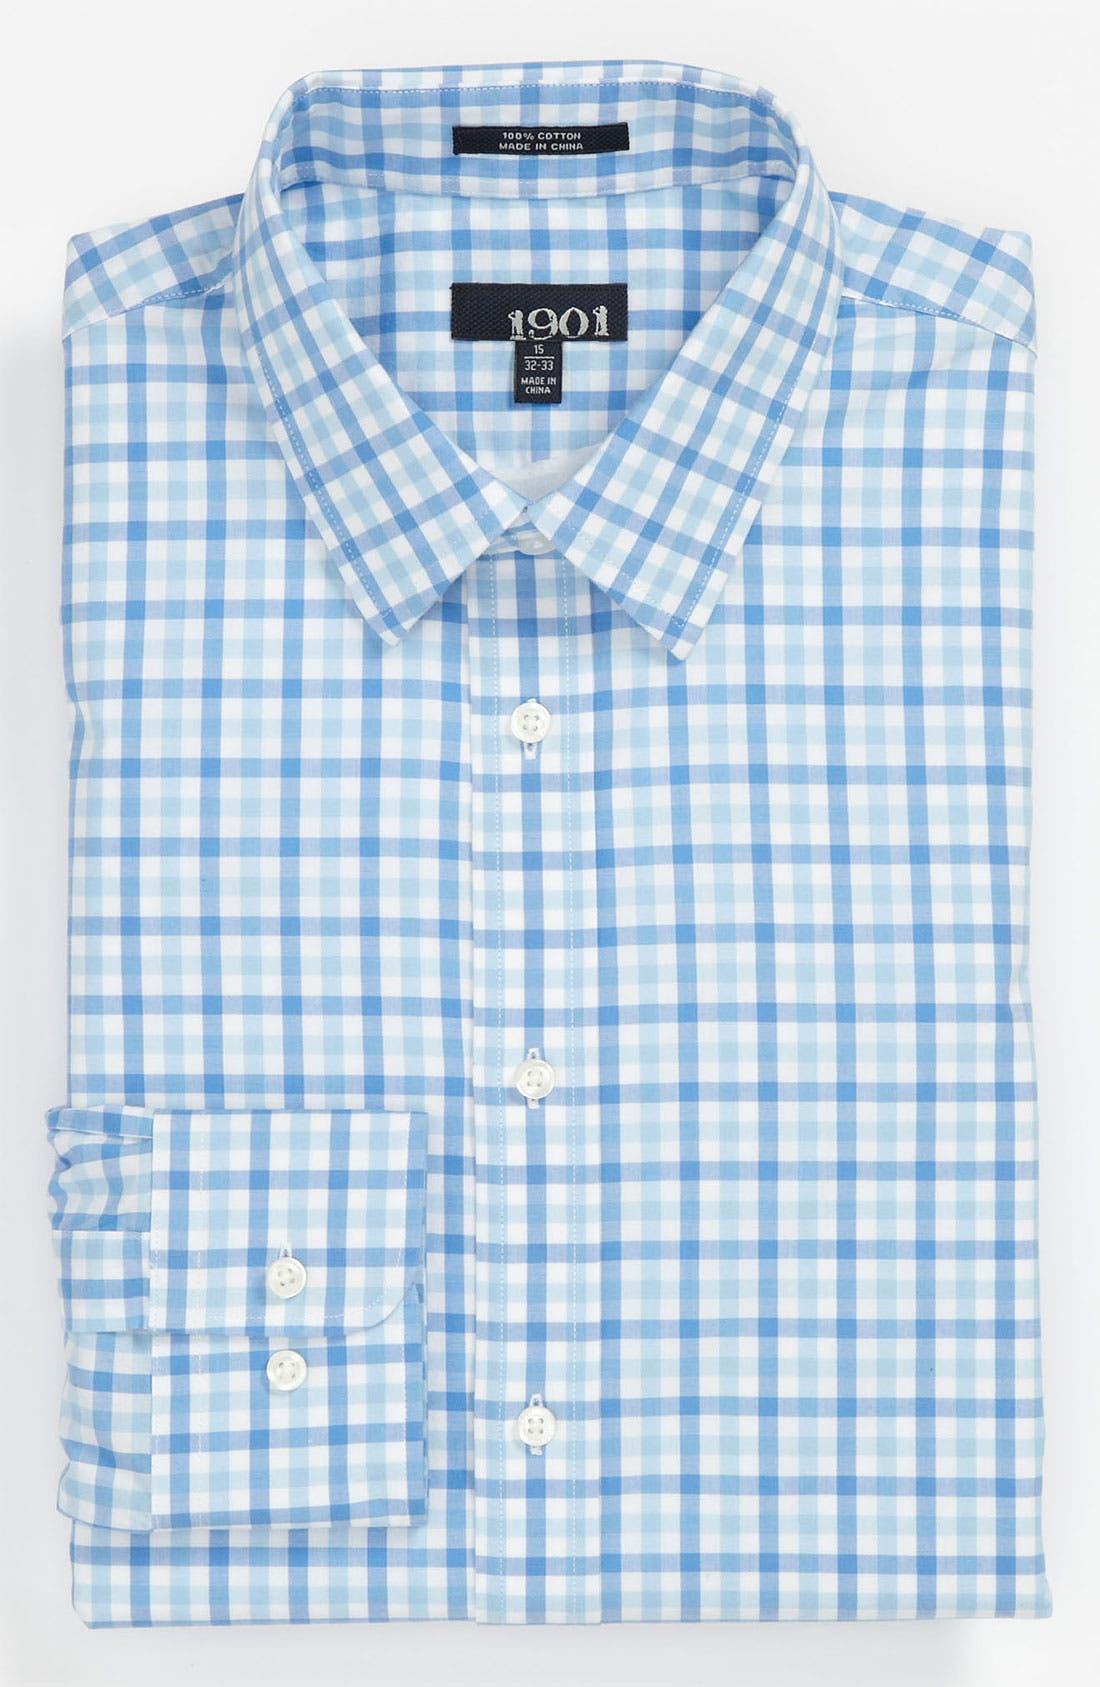 Alternate Image 1 Selected - 1901 Trim Fit Cotton Dress Shirt